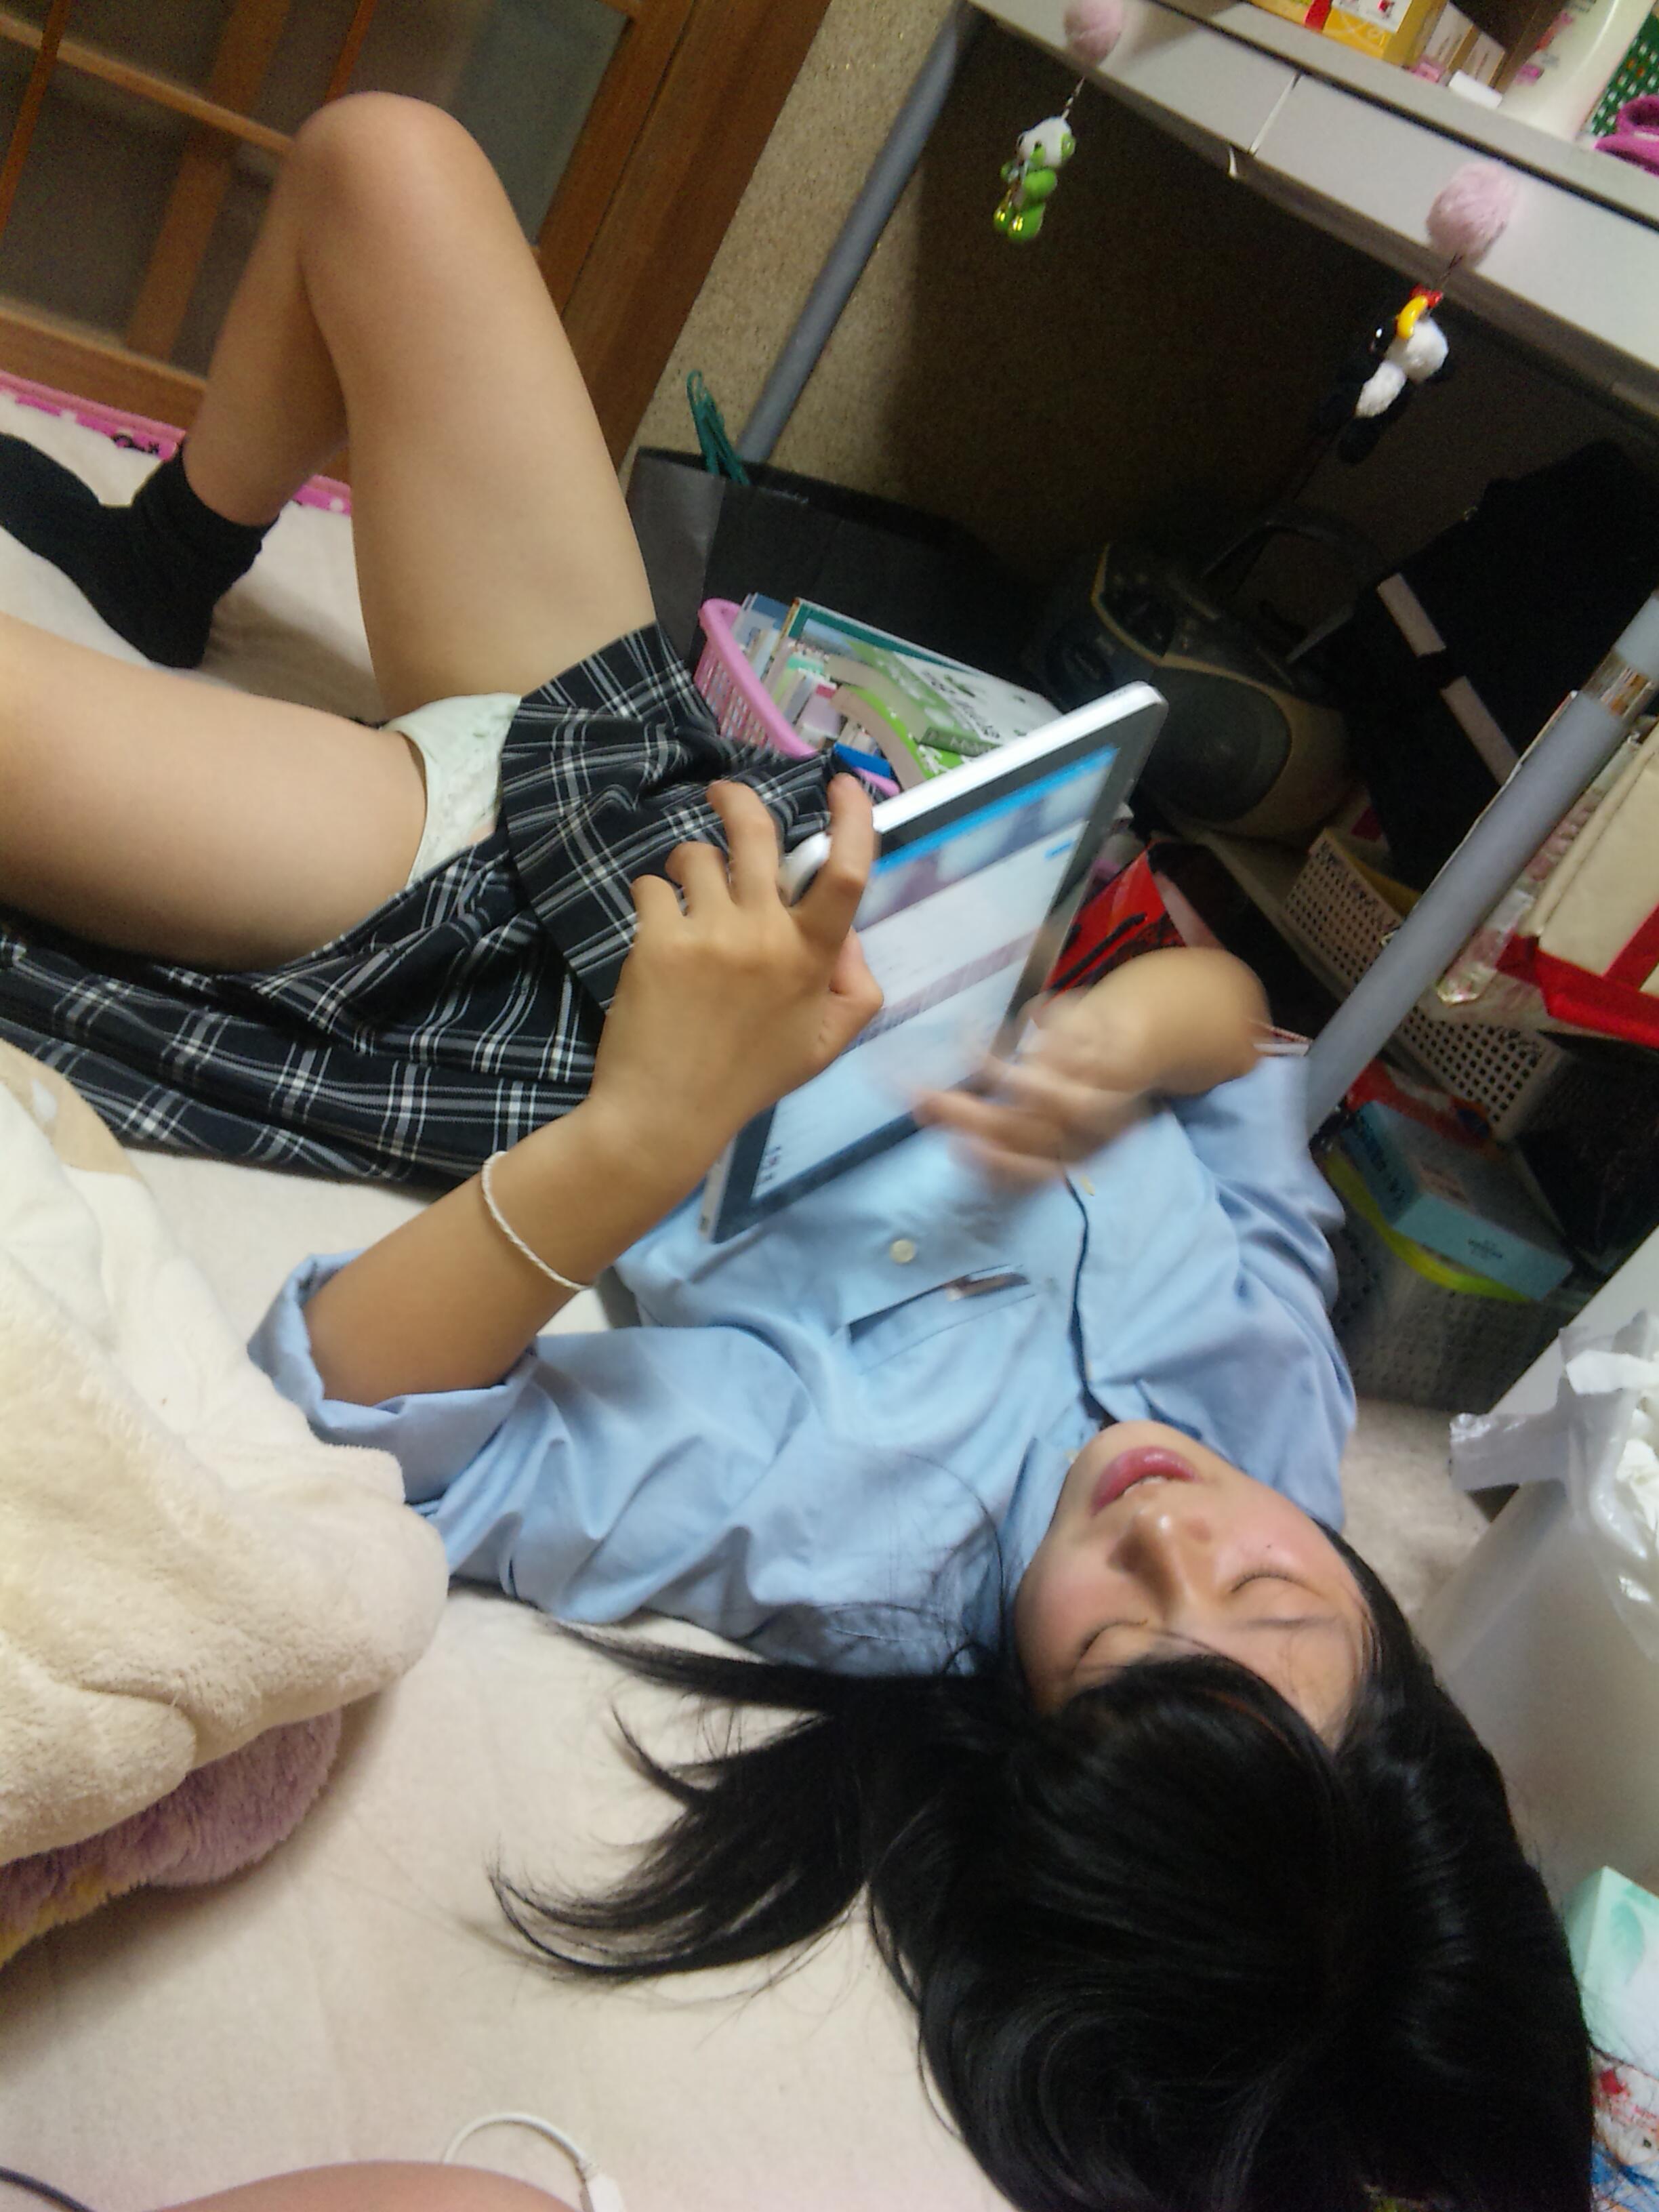 中学生 LINE裸画像 中学生 LINE裸画像 中学生温泉盗撮 jkエロ